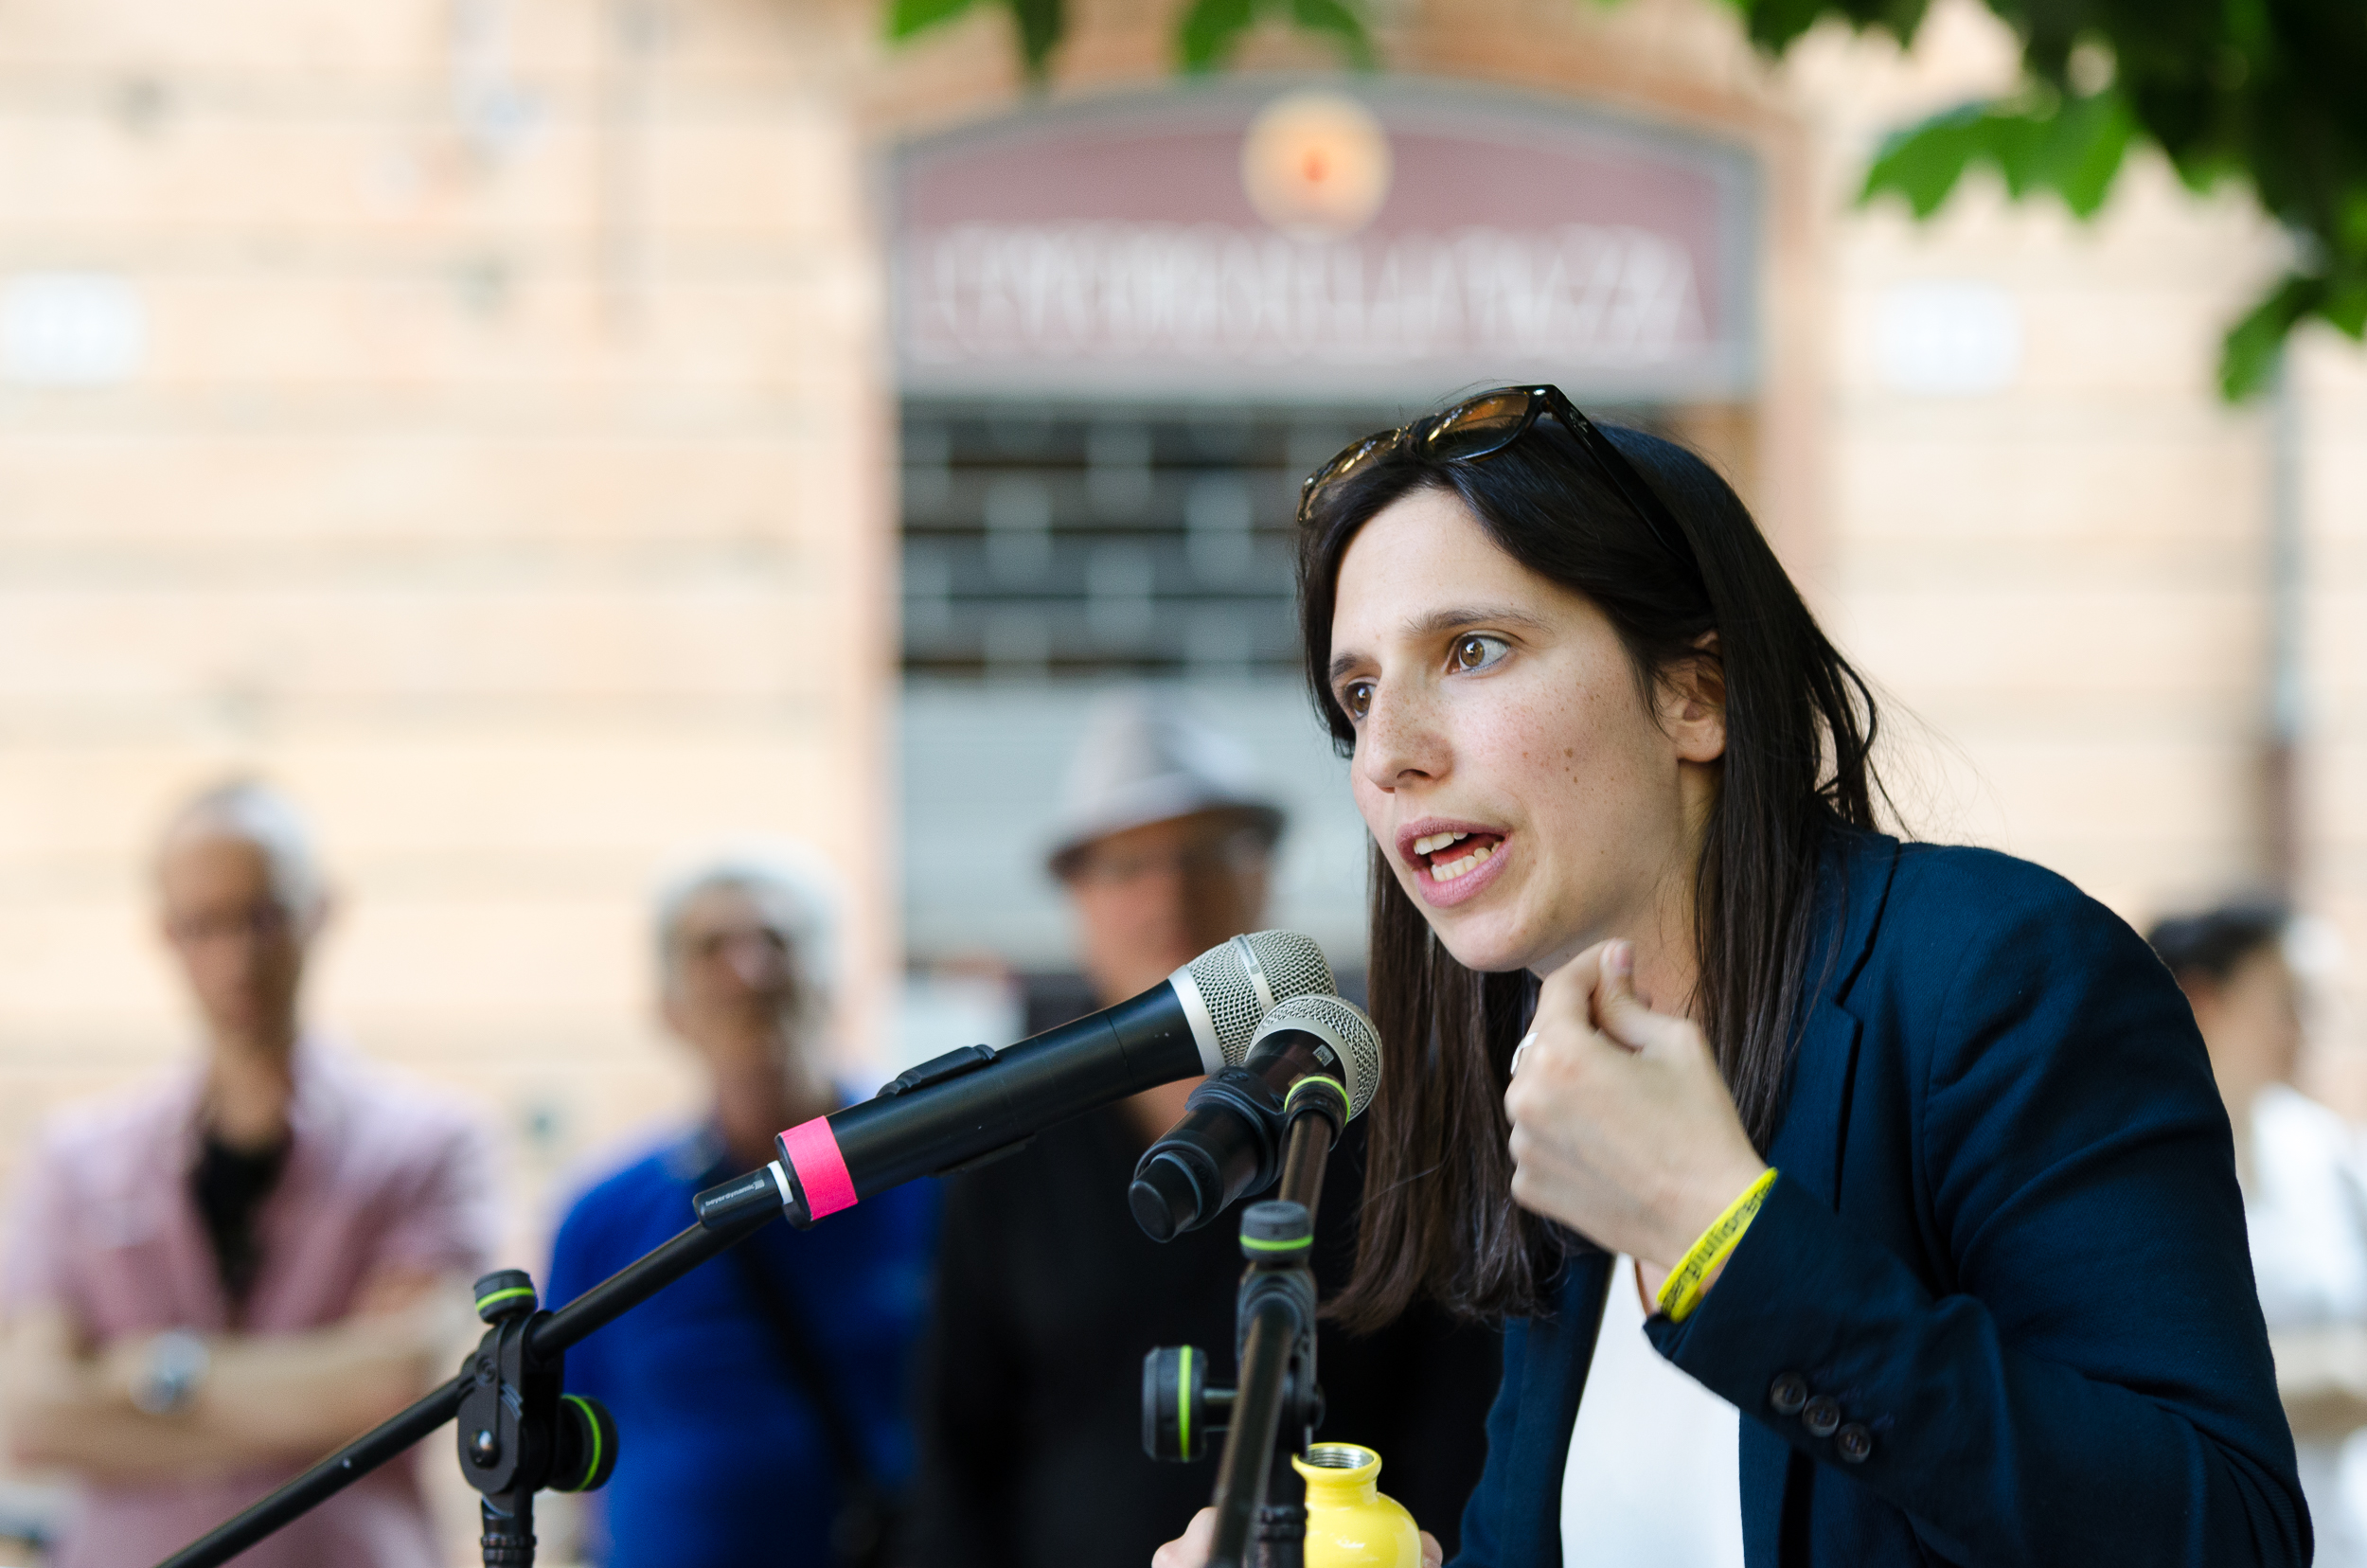 Elly Schlein a Ferrara – 3 giugno 2019